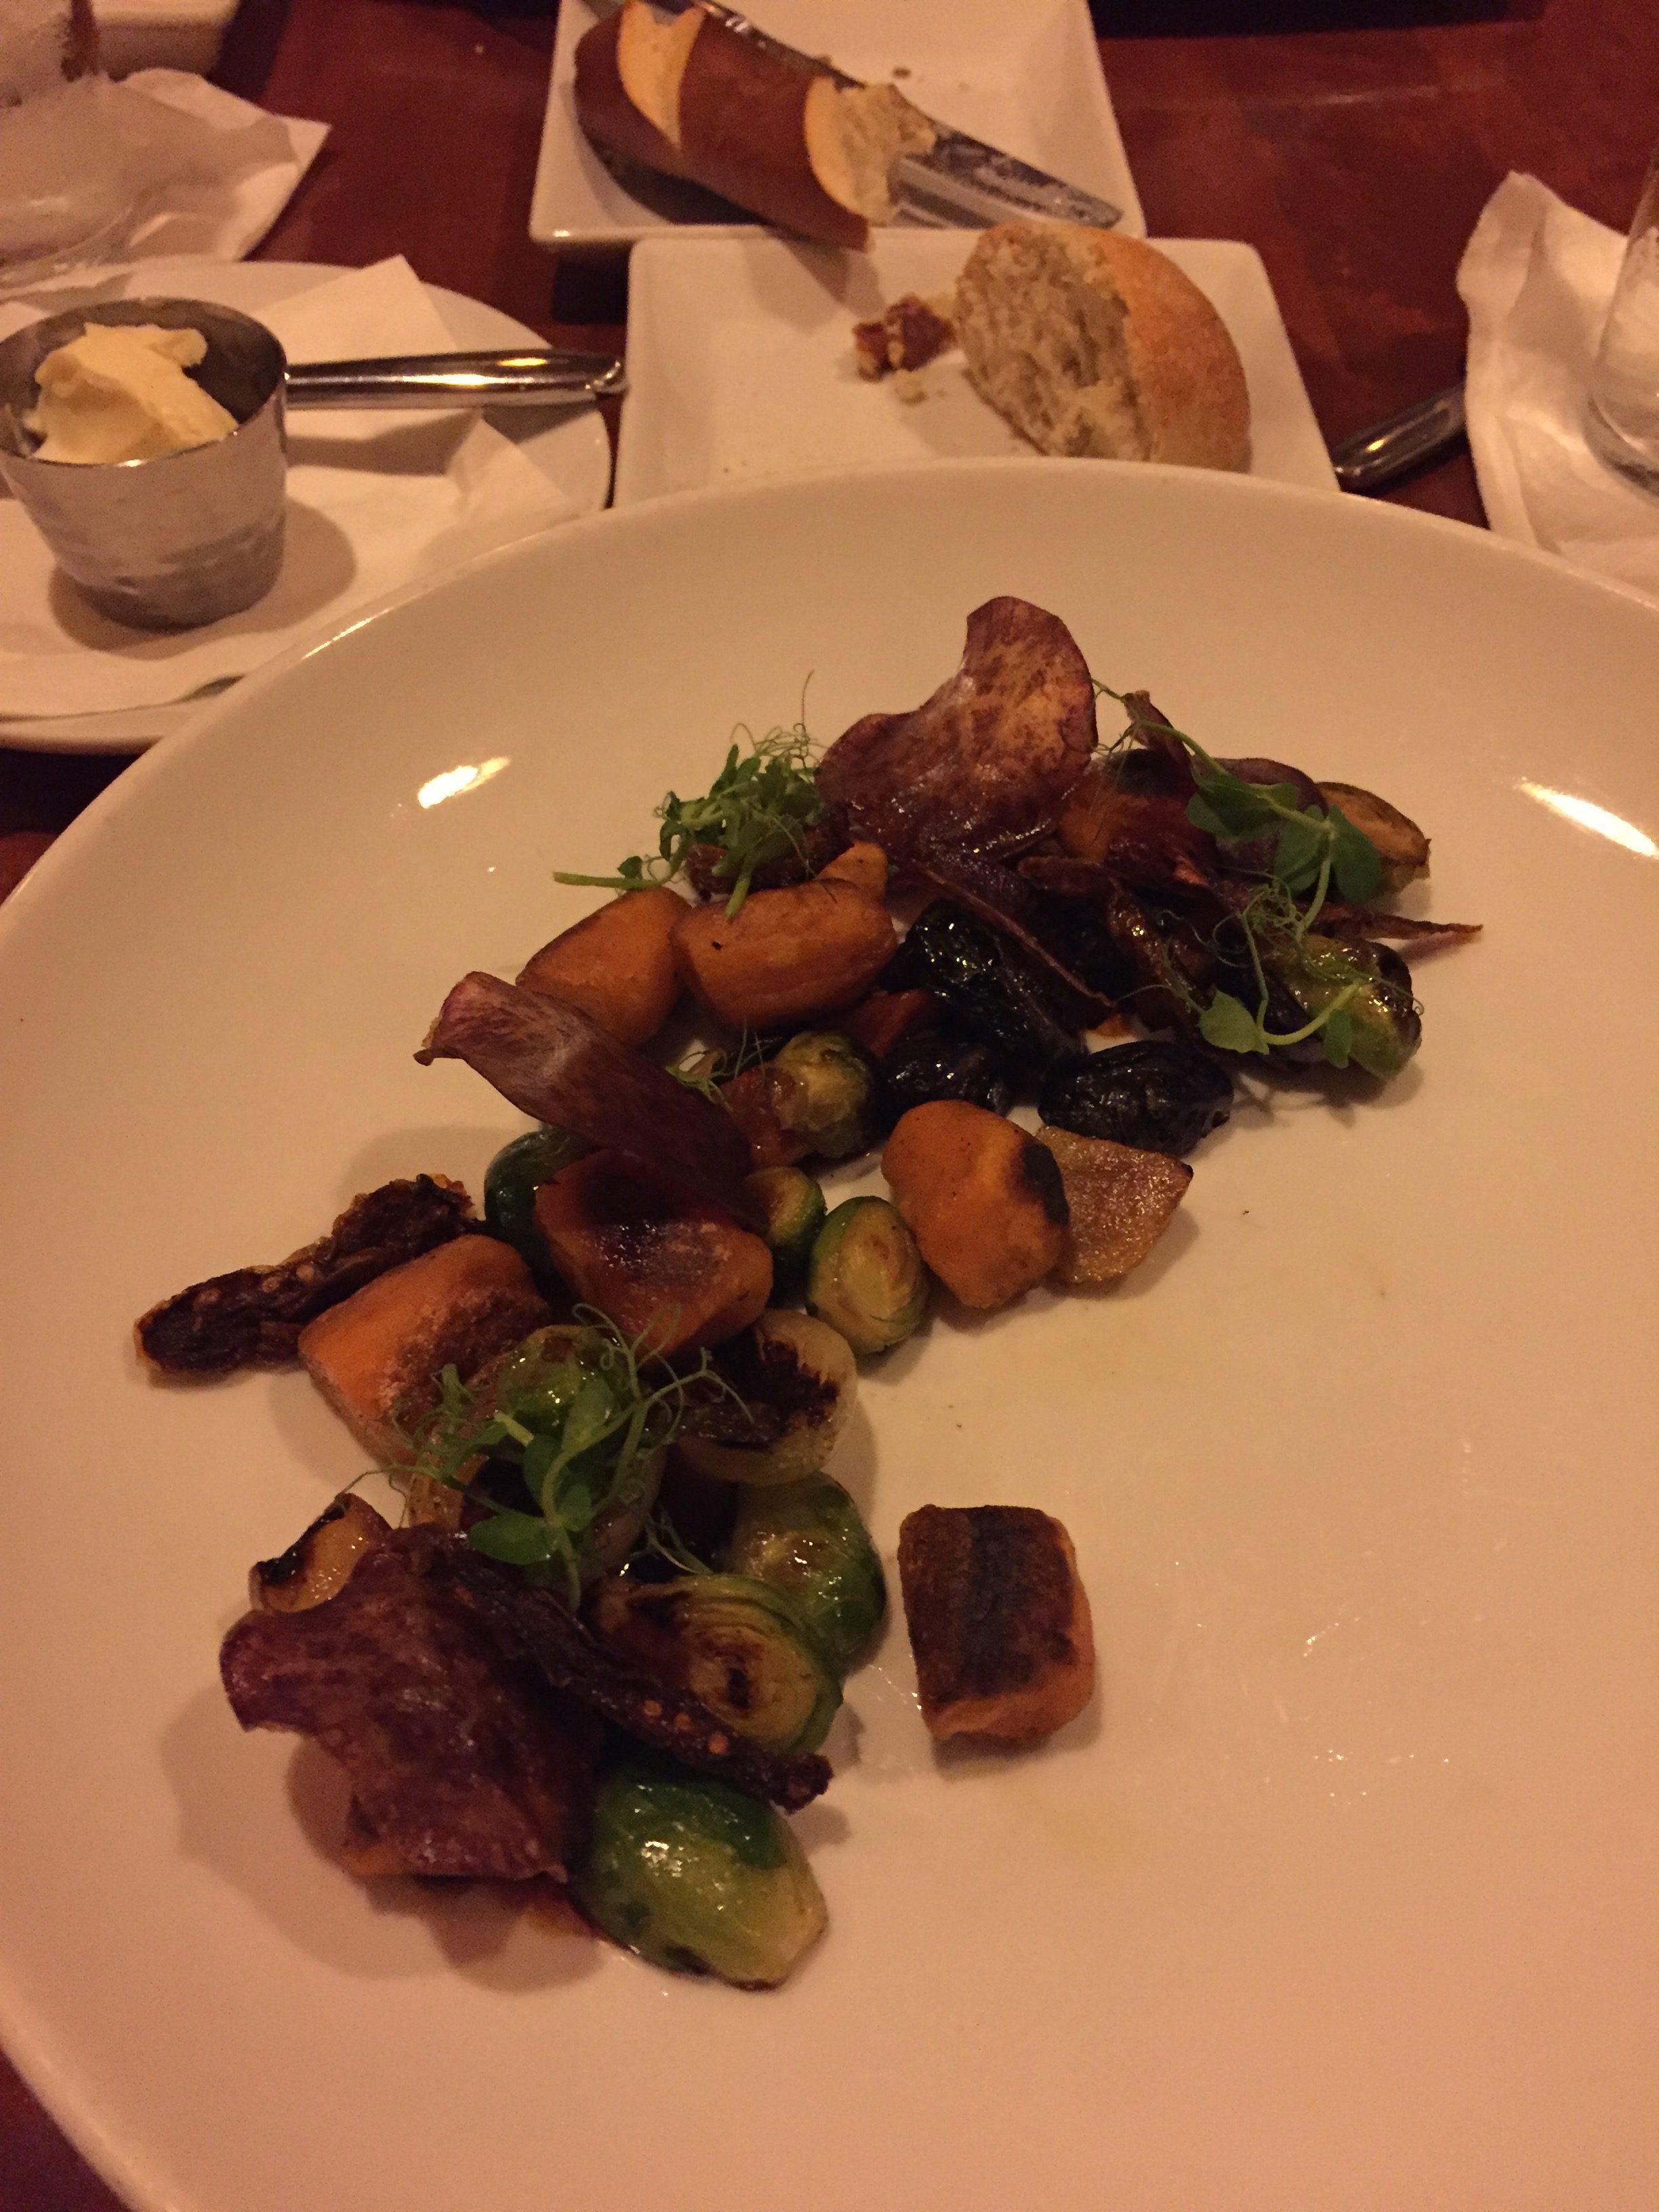 Vegan dining at Epcot's Le Cellier #vegan #travel